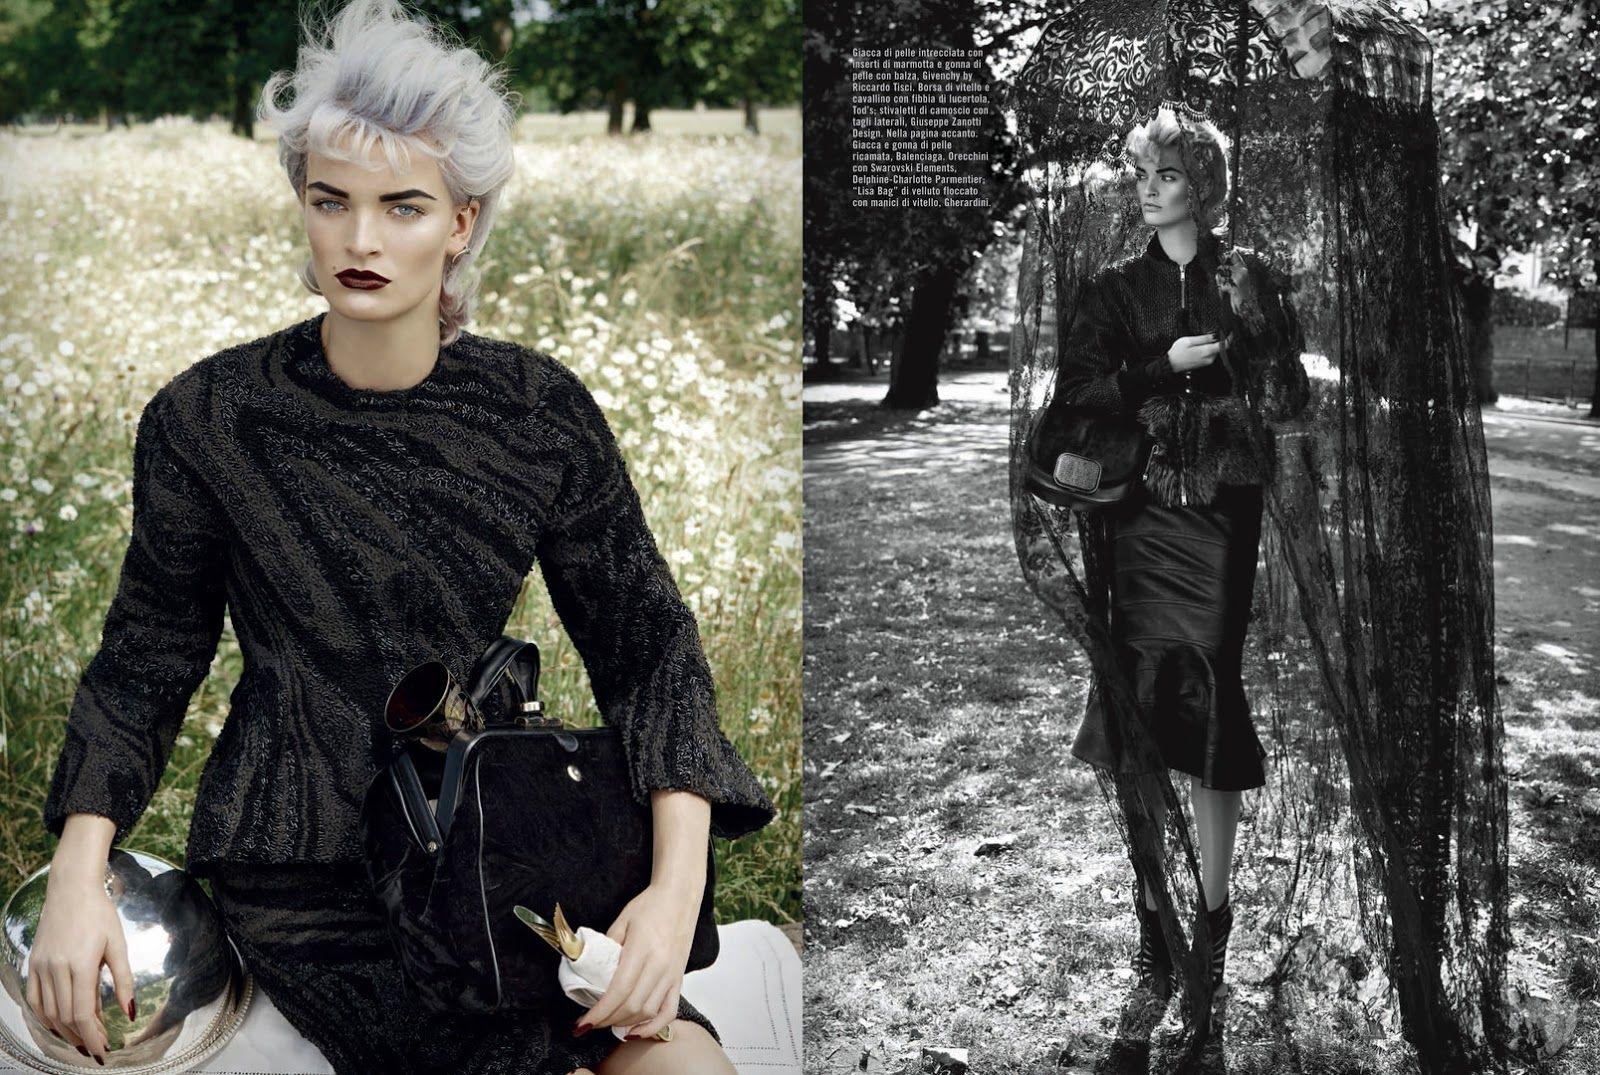 visual optimism; fashion editorials, shows, campaigns & more!: juliane gruner by david dunan for vogue italia september 2013